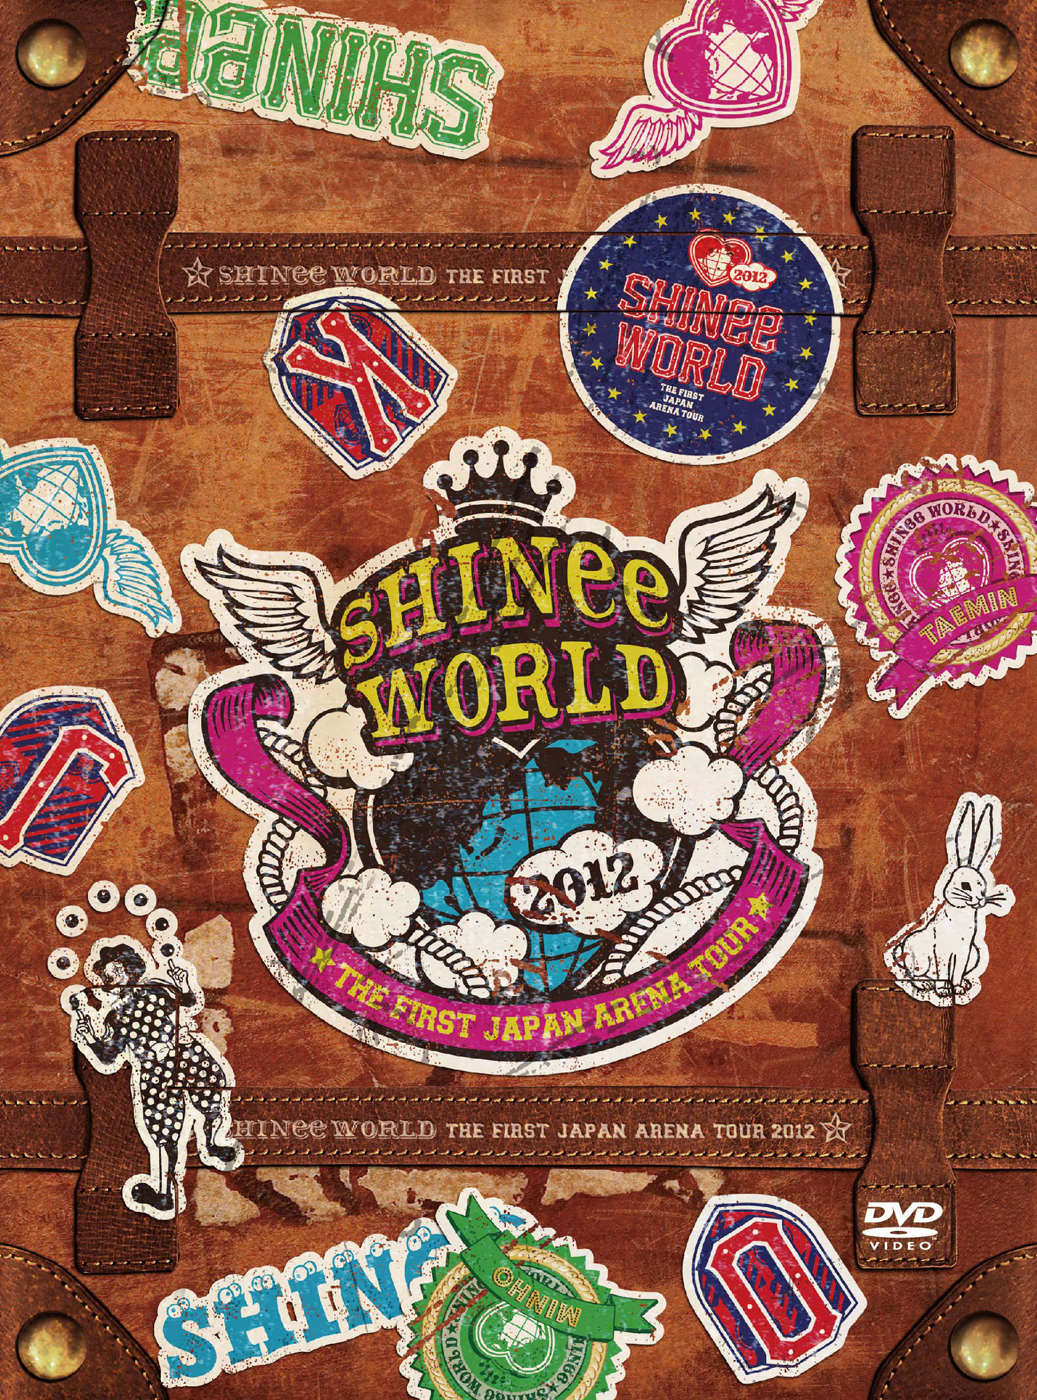 20190928.1508.6 SHINee - First Japan Arena Tour SHINee World 2012 (2 DVD) cover 1.jpg